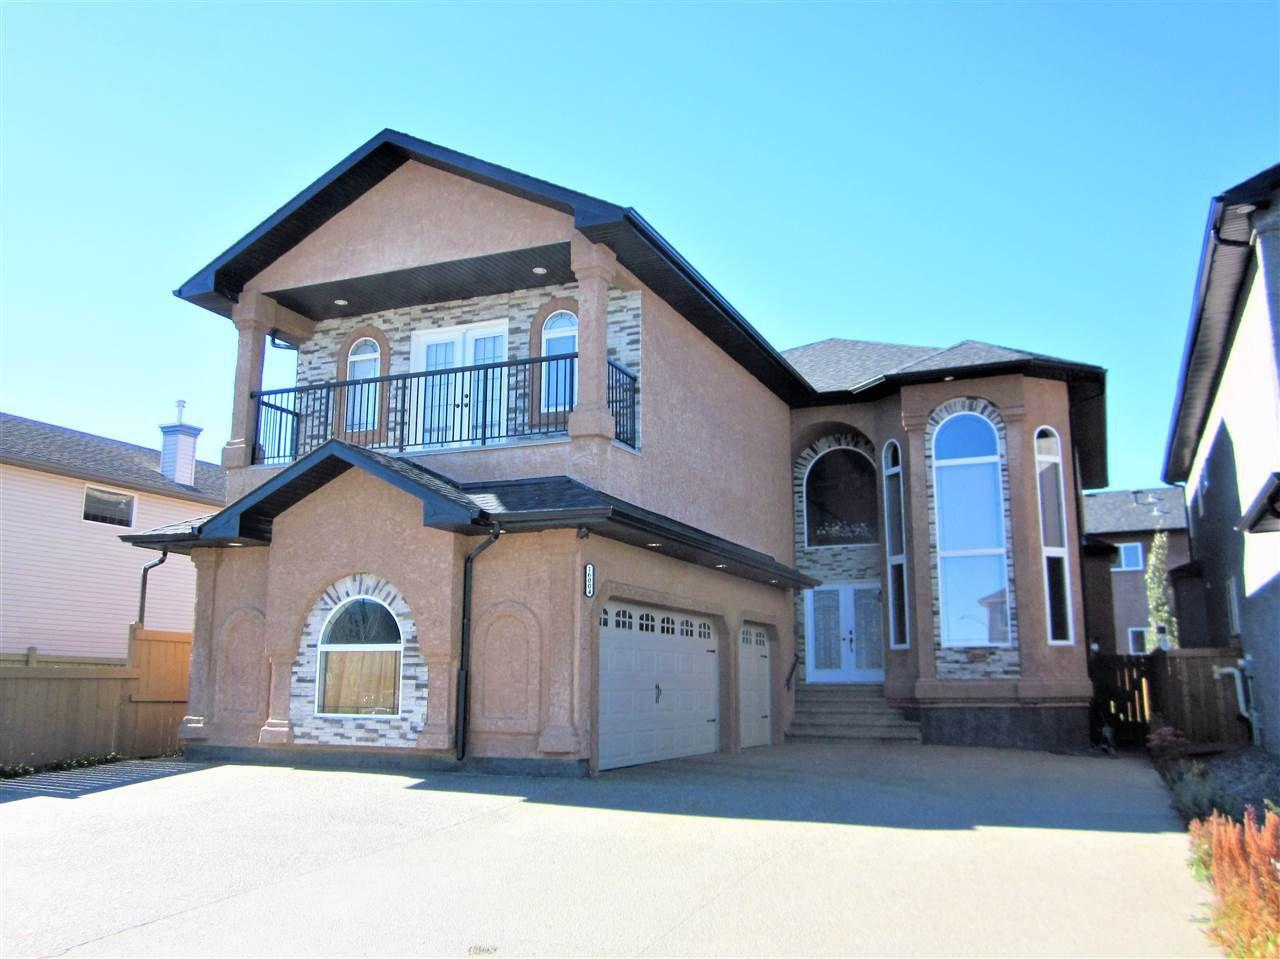 Main Photo: 16004 139 Street in Edmonton: Zone 27 House for sale : MLS®# E4123840